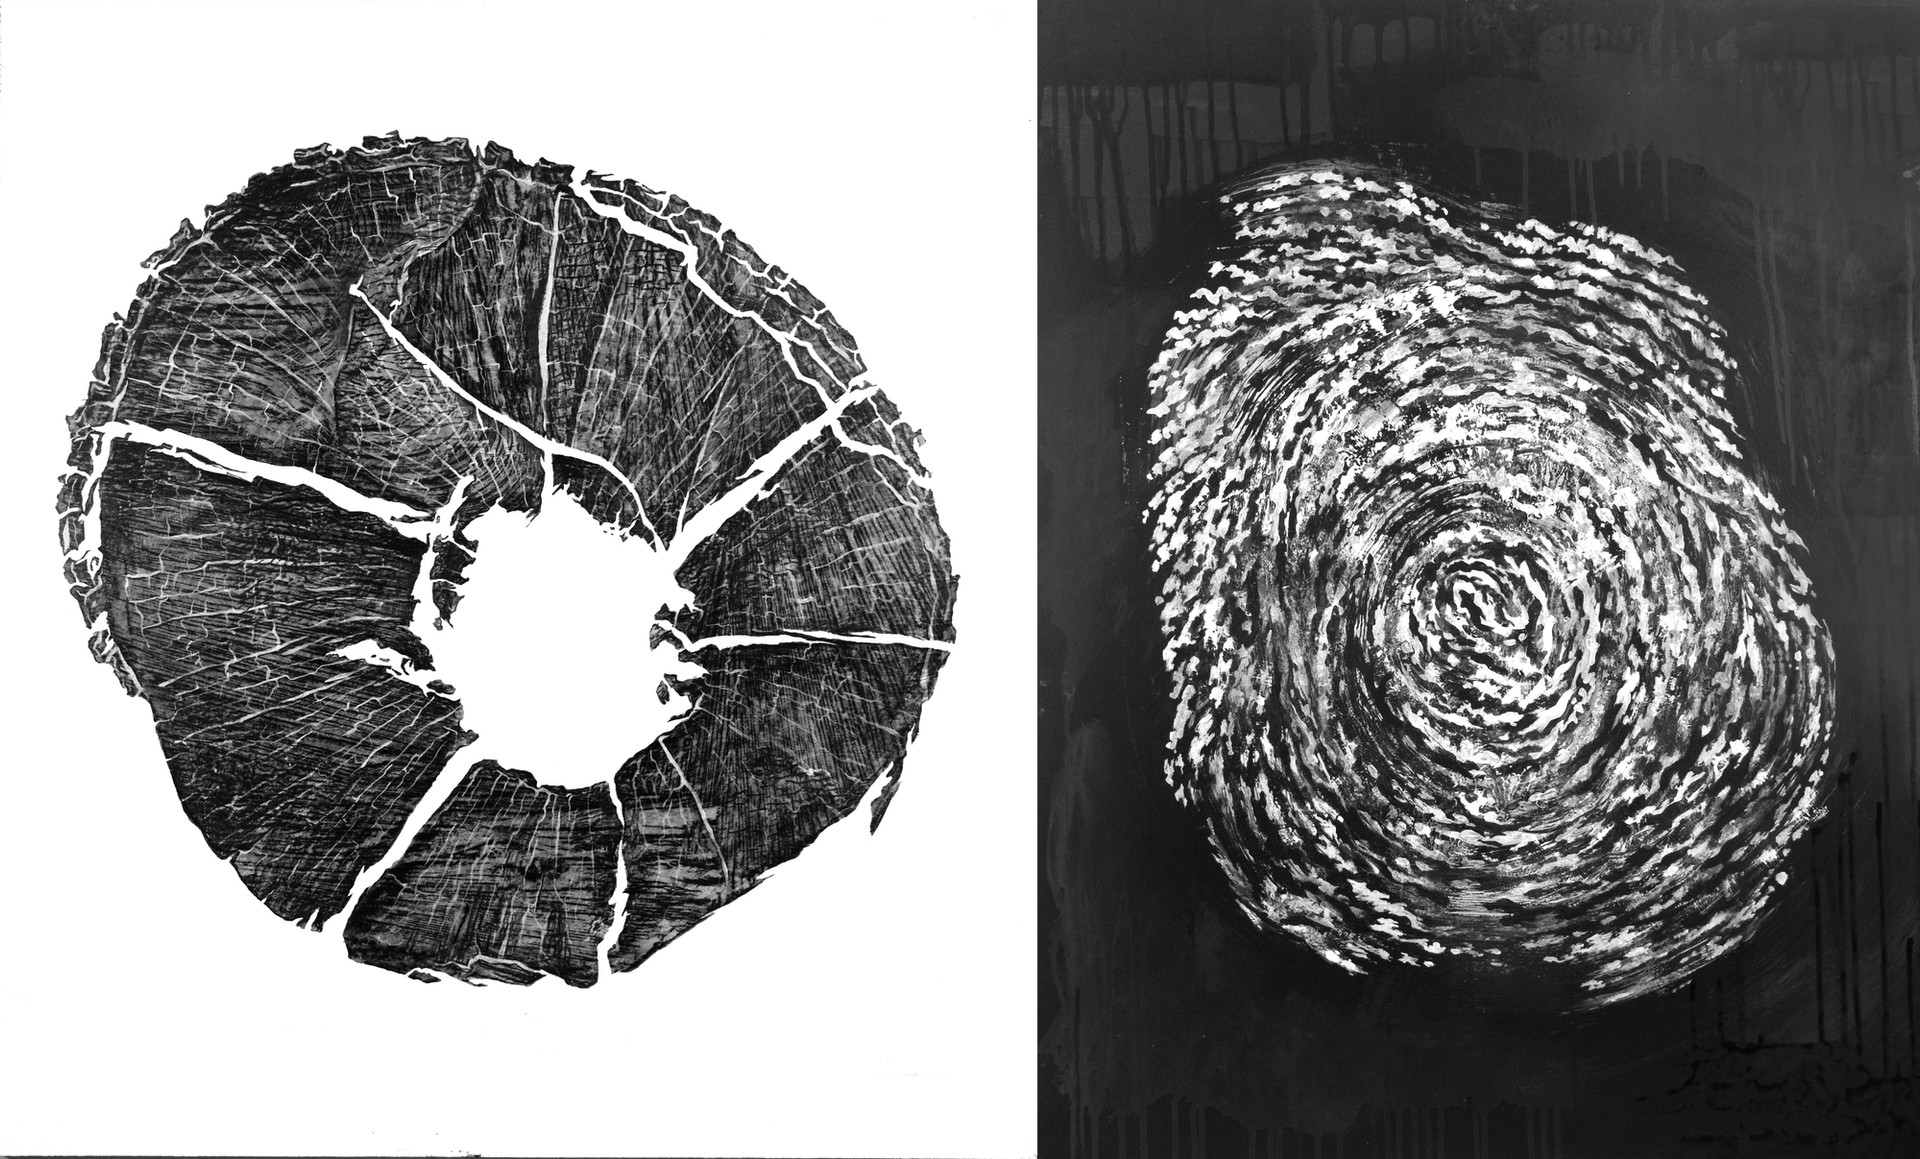 Saving Trees Through Art 5